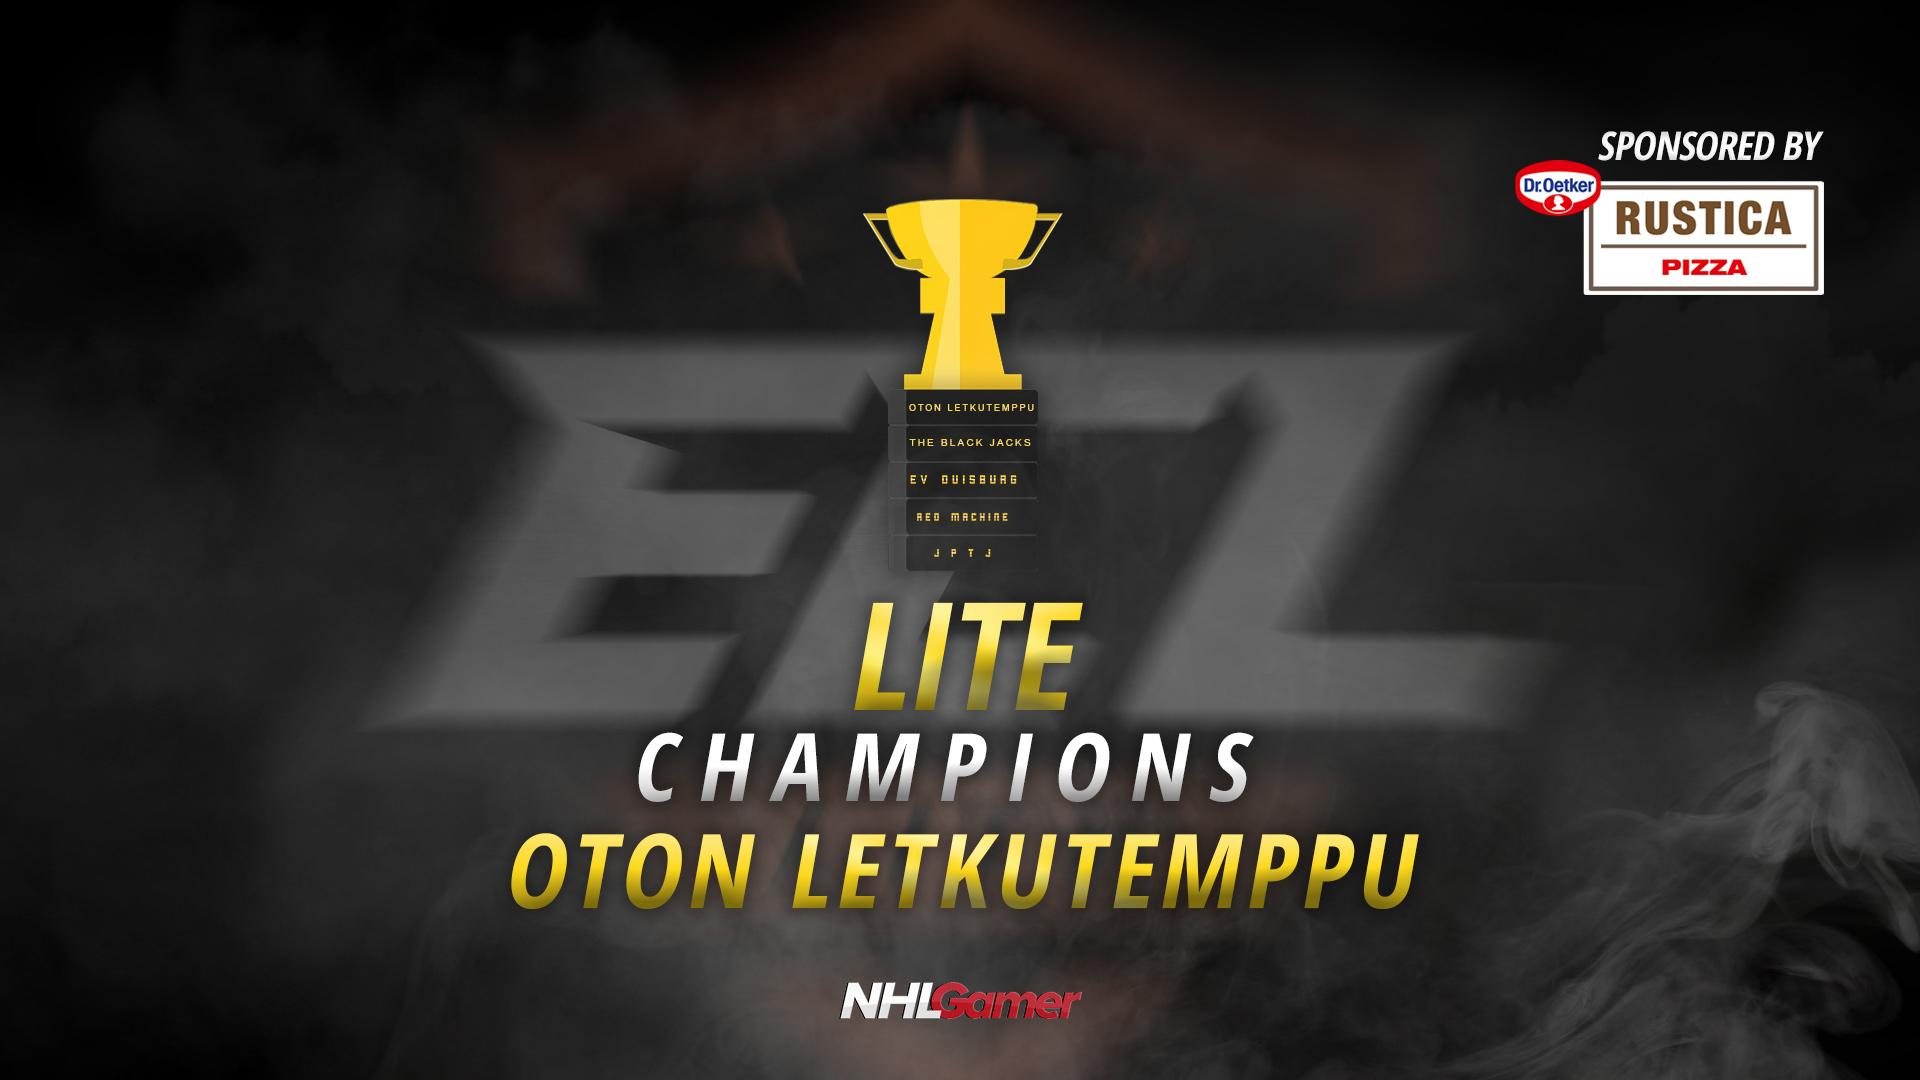 ECL_Lite_Champons_Oton_Letkutemppu.jpg